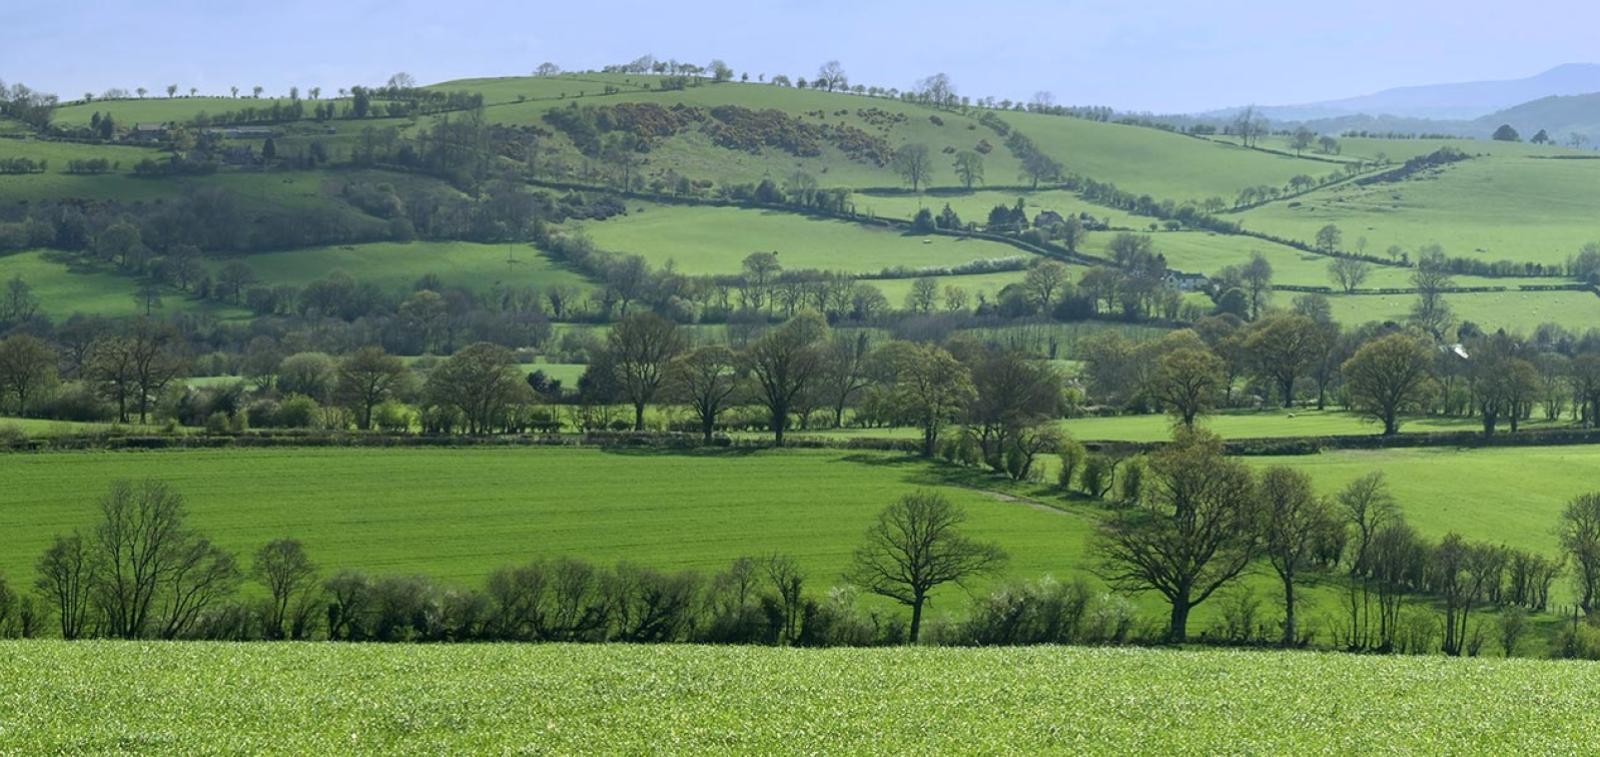 Lush green countryside